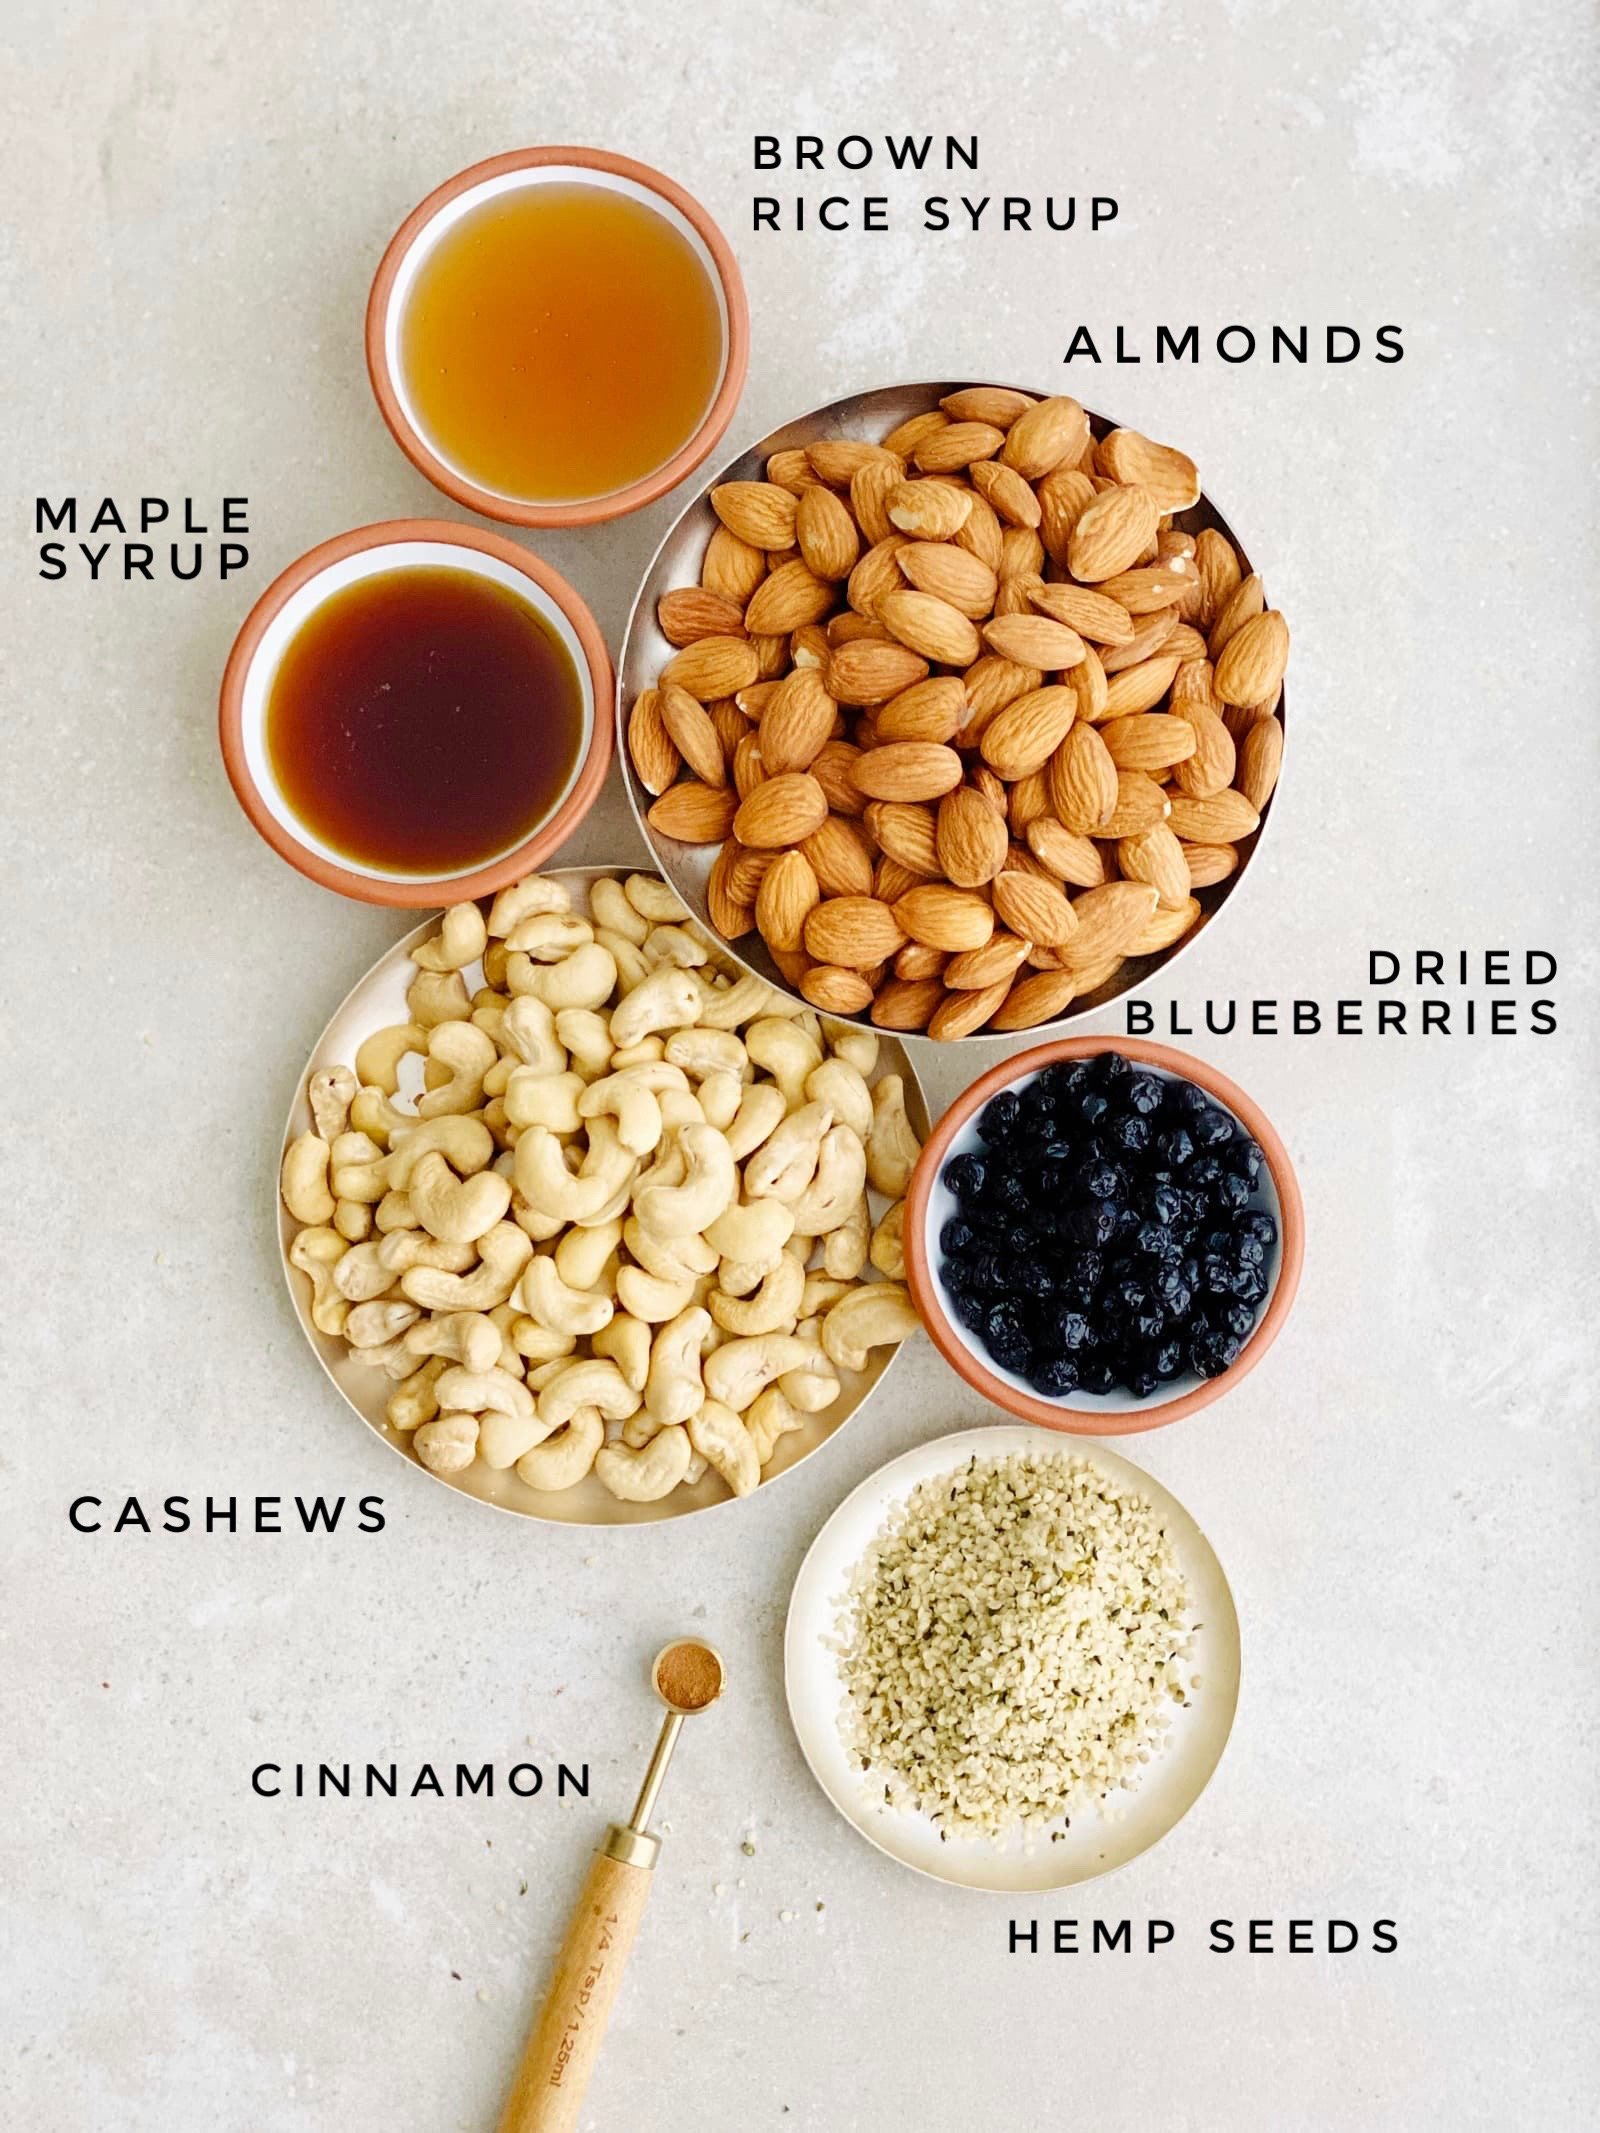 Homemade Fruit & Nut KIND Bars With Blueberries Ingredients  Vegan & Gluten-free